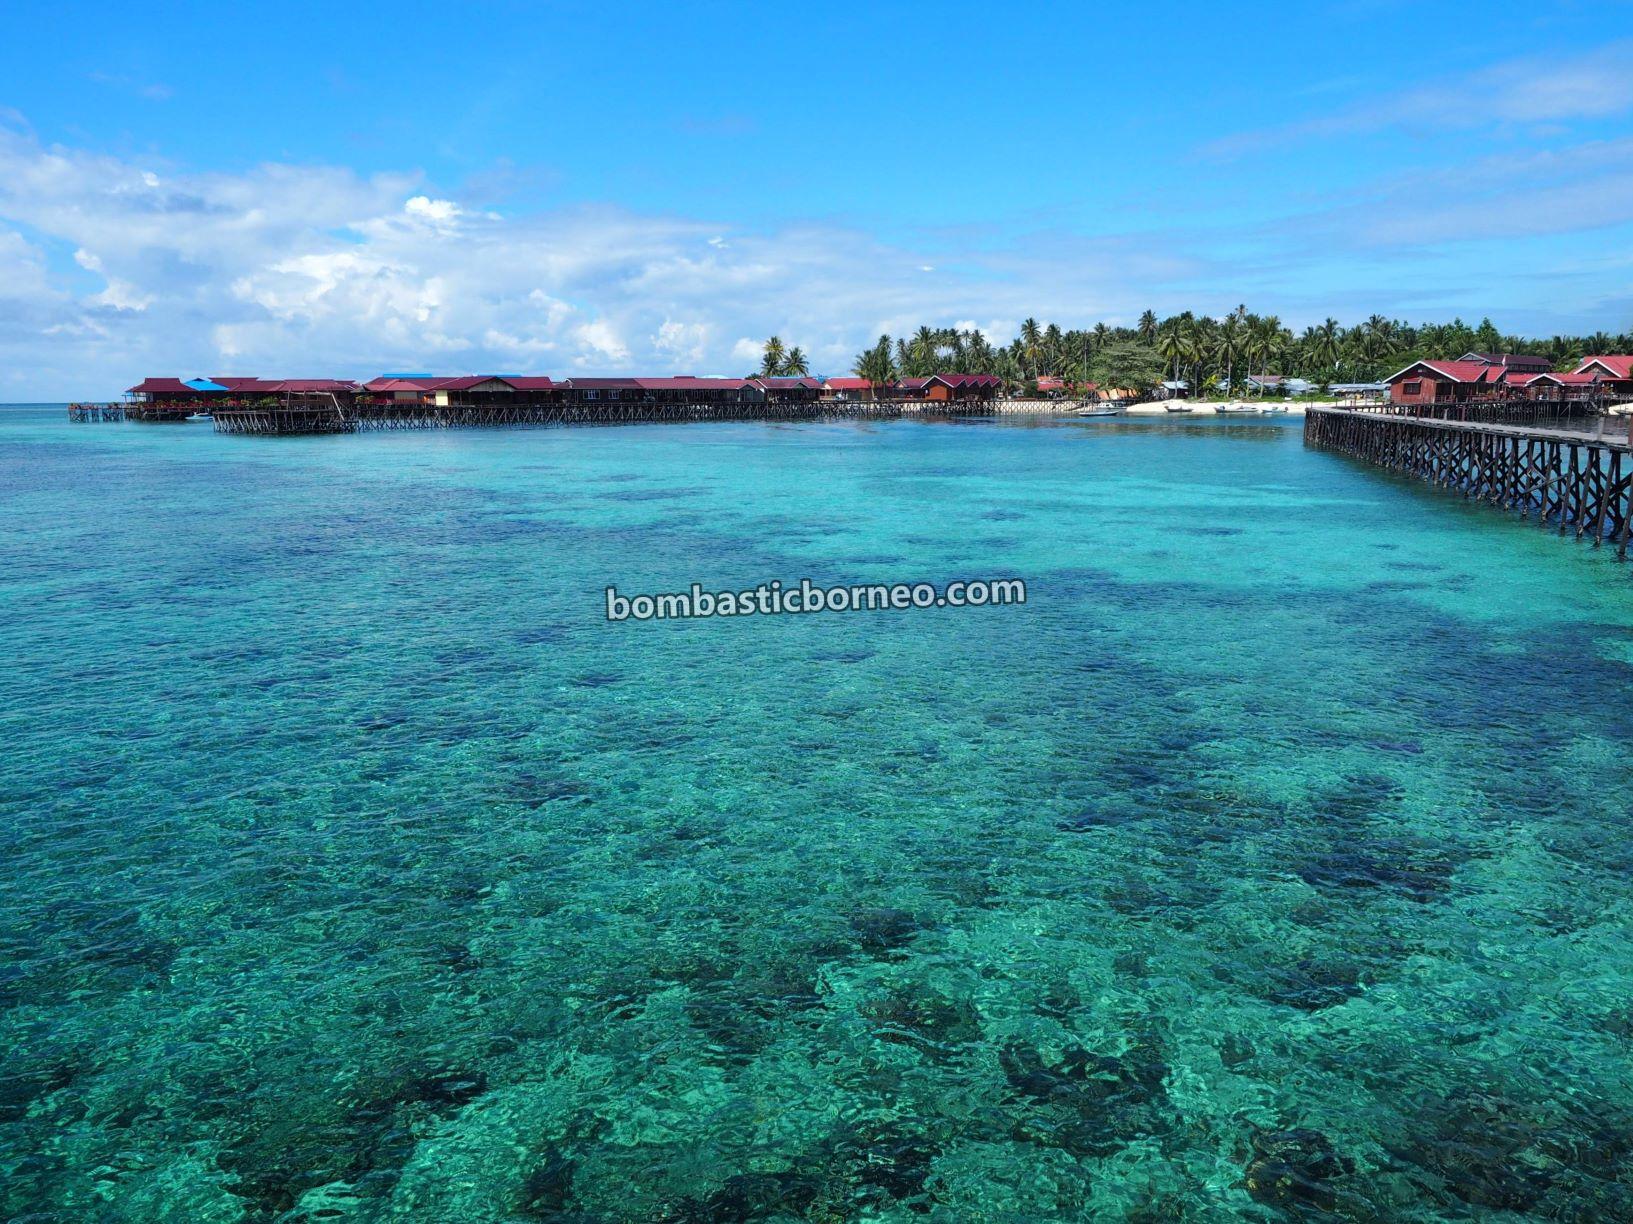 Kepulauan Derawan, Destination, diving spot, exploration, vacation, snorkelling, Berau, Kalimantan Timur, Sulawesi Sea, wisata alam, Tourism, travel guide, 探索婆罗洲游踪, 印尼东加里曼丹, 达拉湾岛旅游景点,